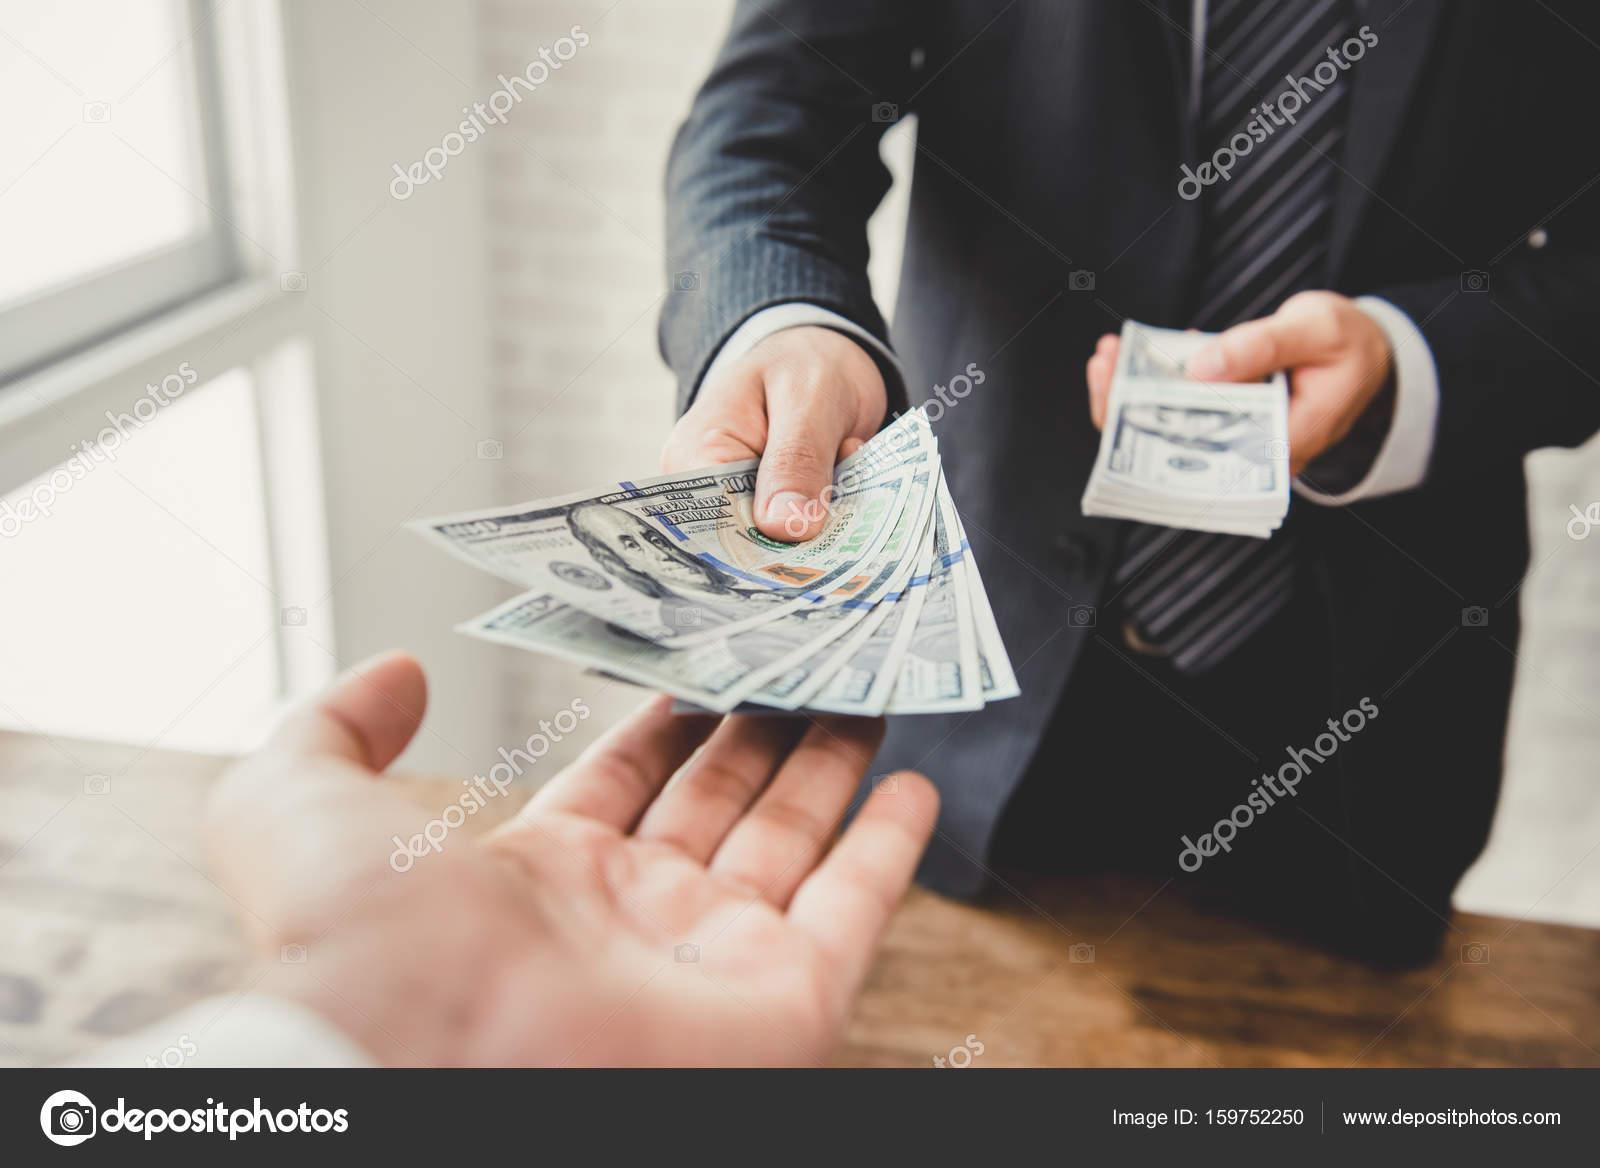 give money займы отзывы